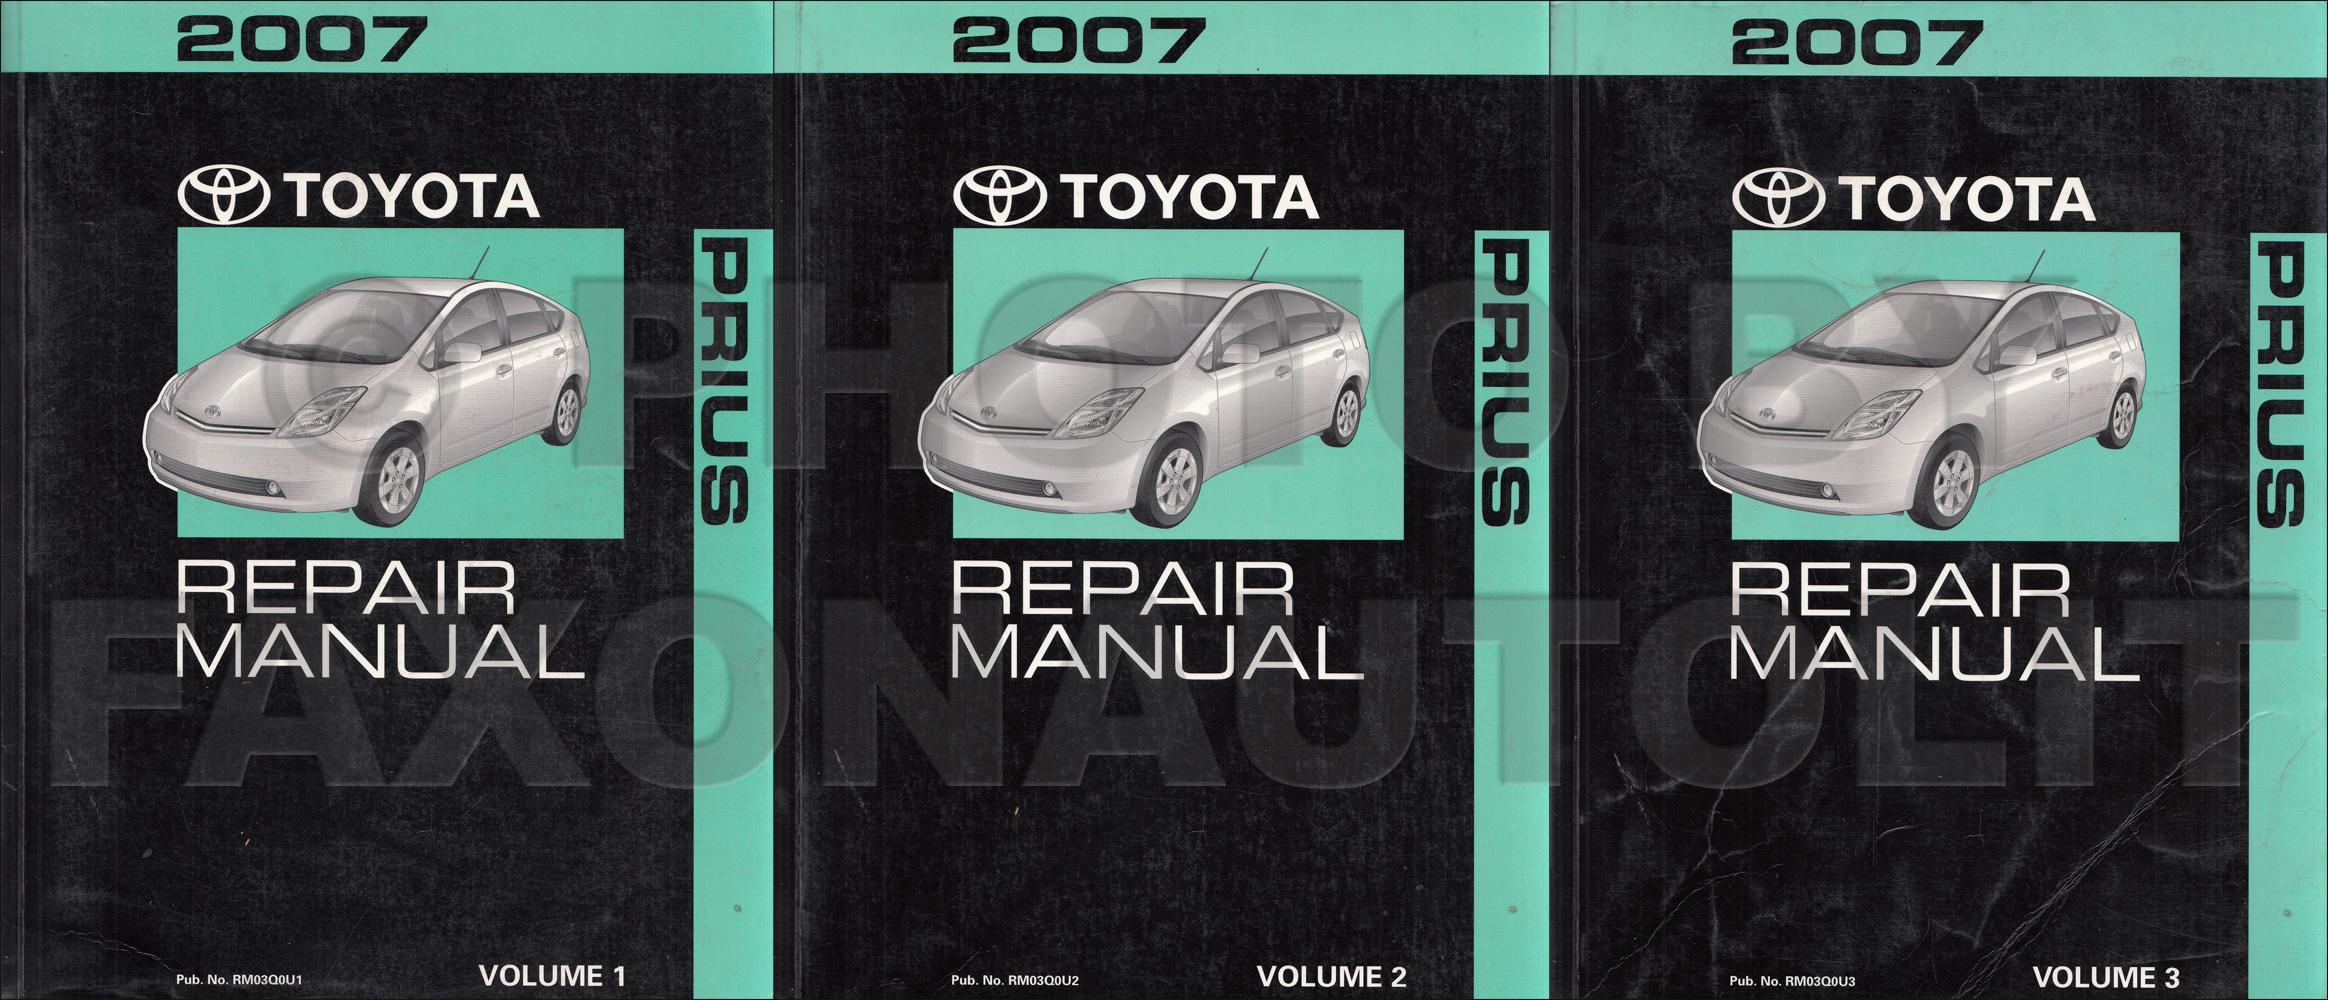 2004 toyota prius manual daily instruction manual guides u2022 rh testingwordpress co 2017 Toyota Prius 2004 toyota prius owners manual download